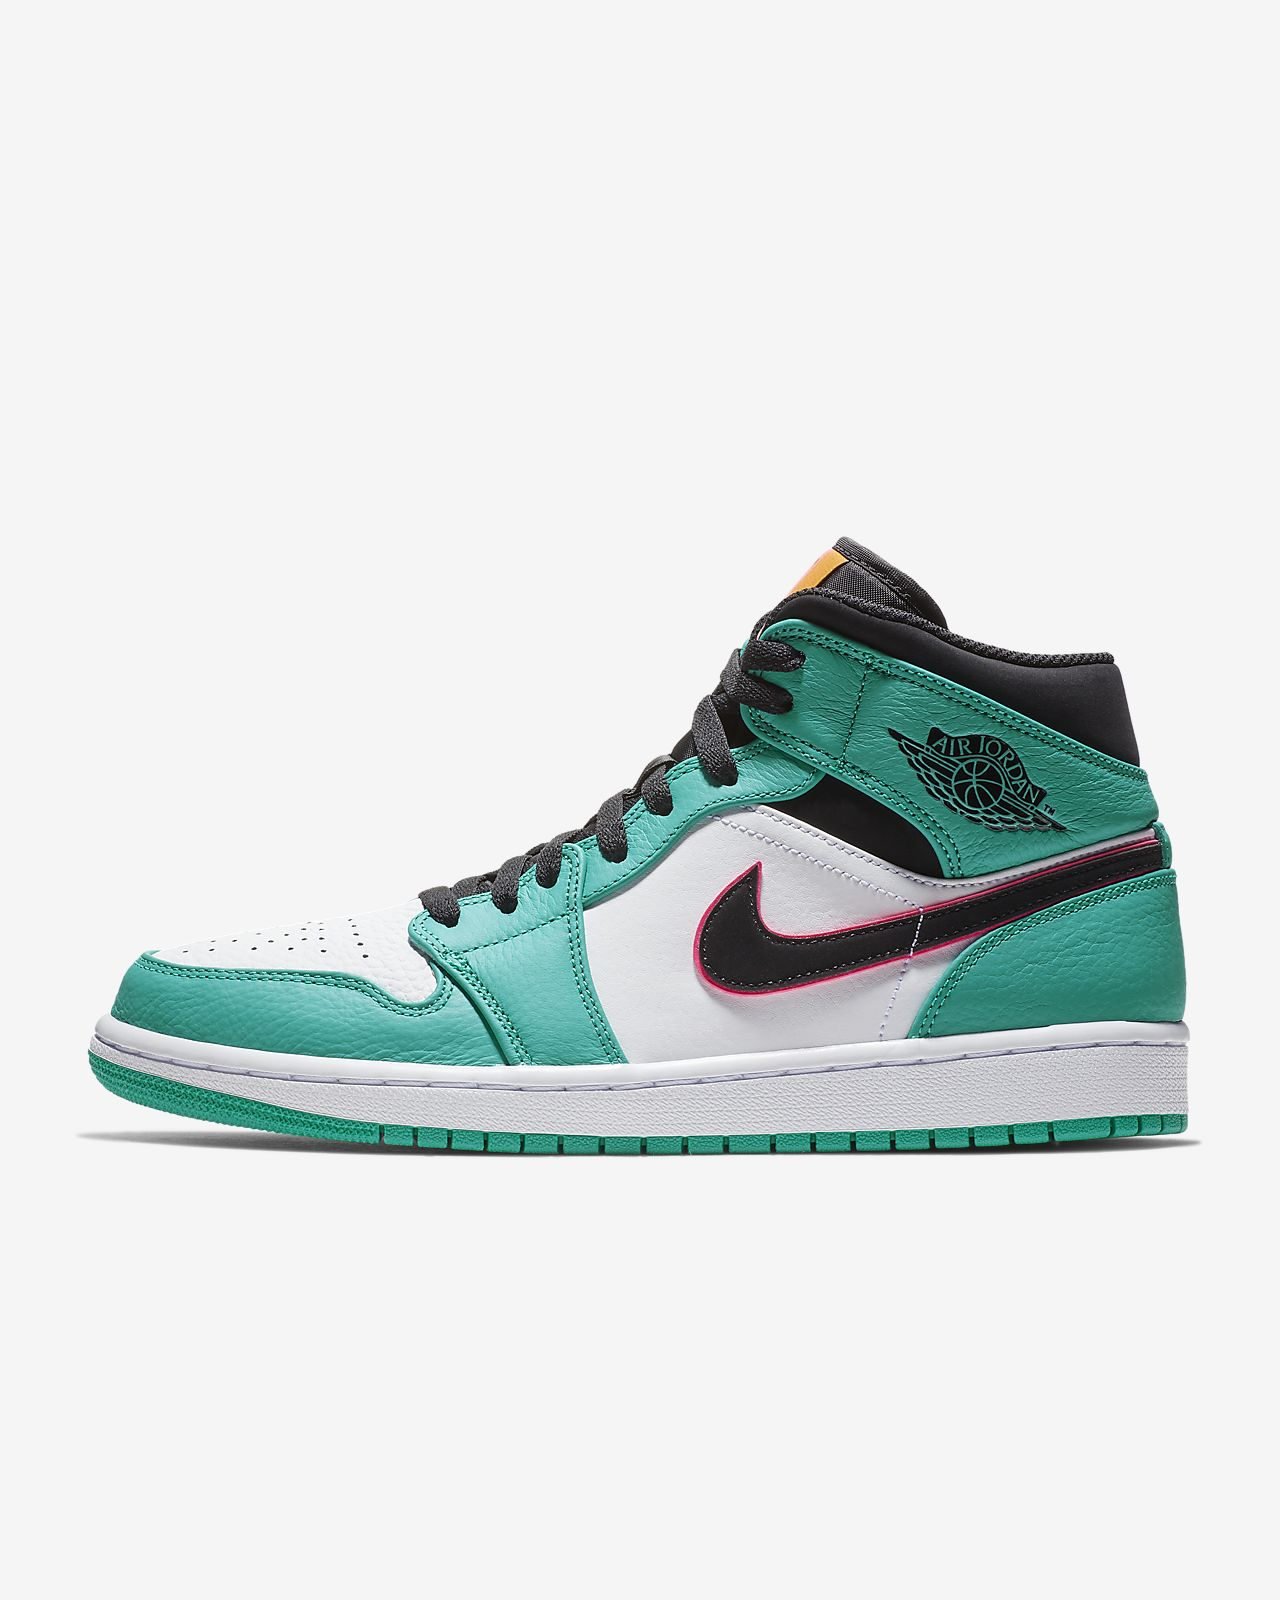 Premium Uomo scarpe. Nike 1 Mid odmxch49 Nuove scarpe